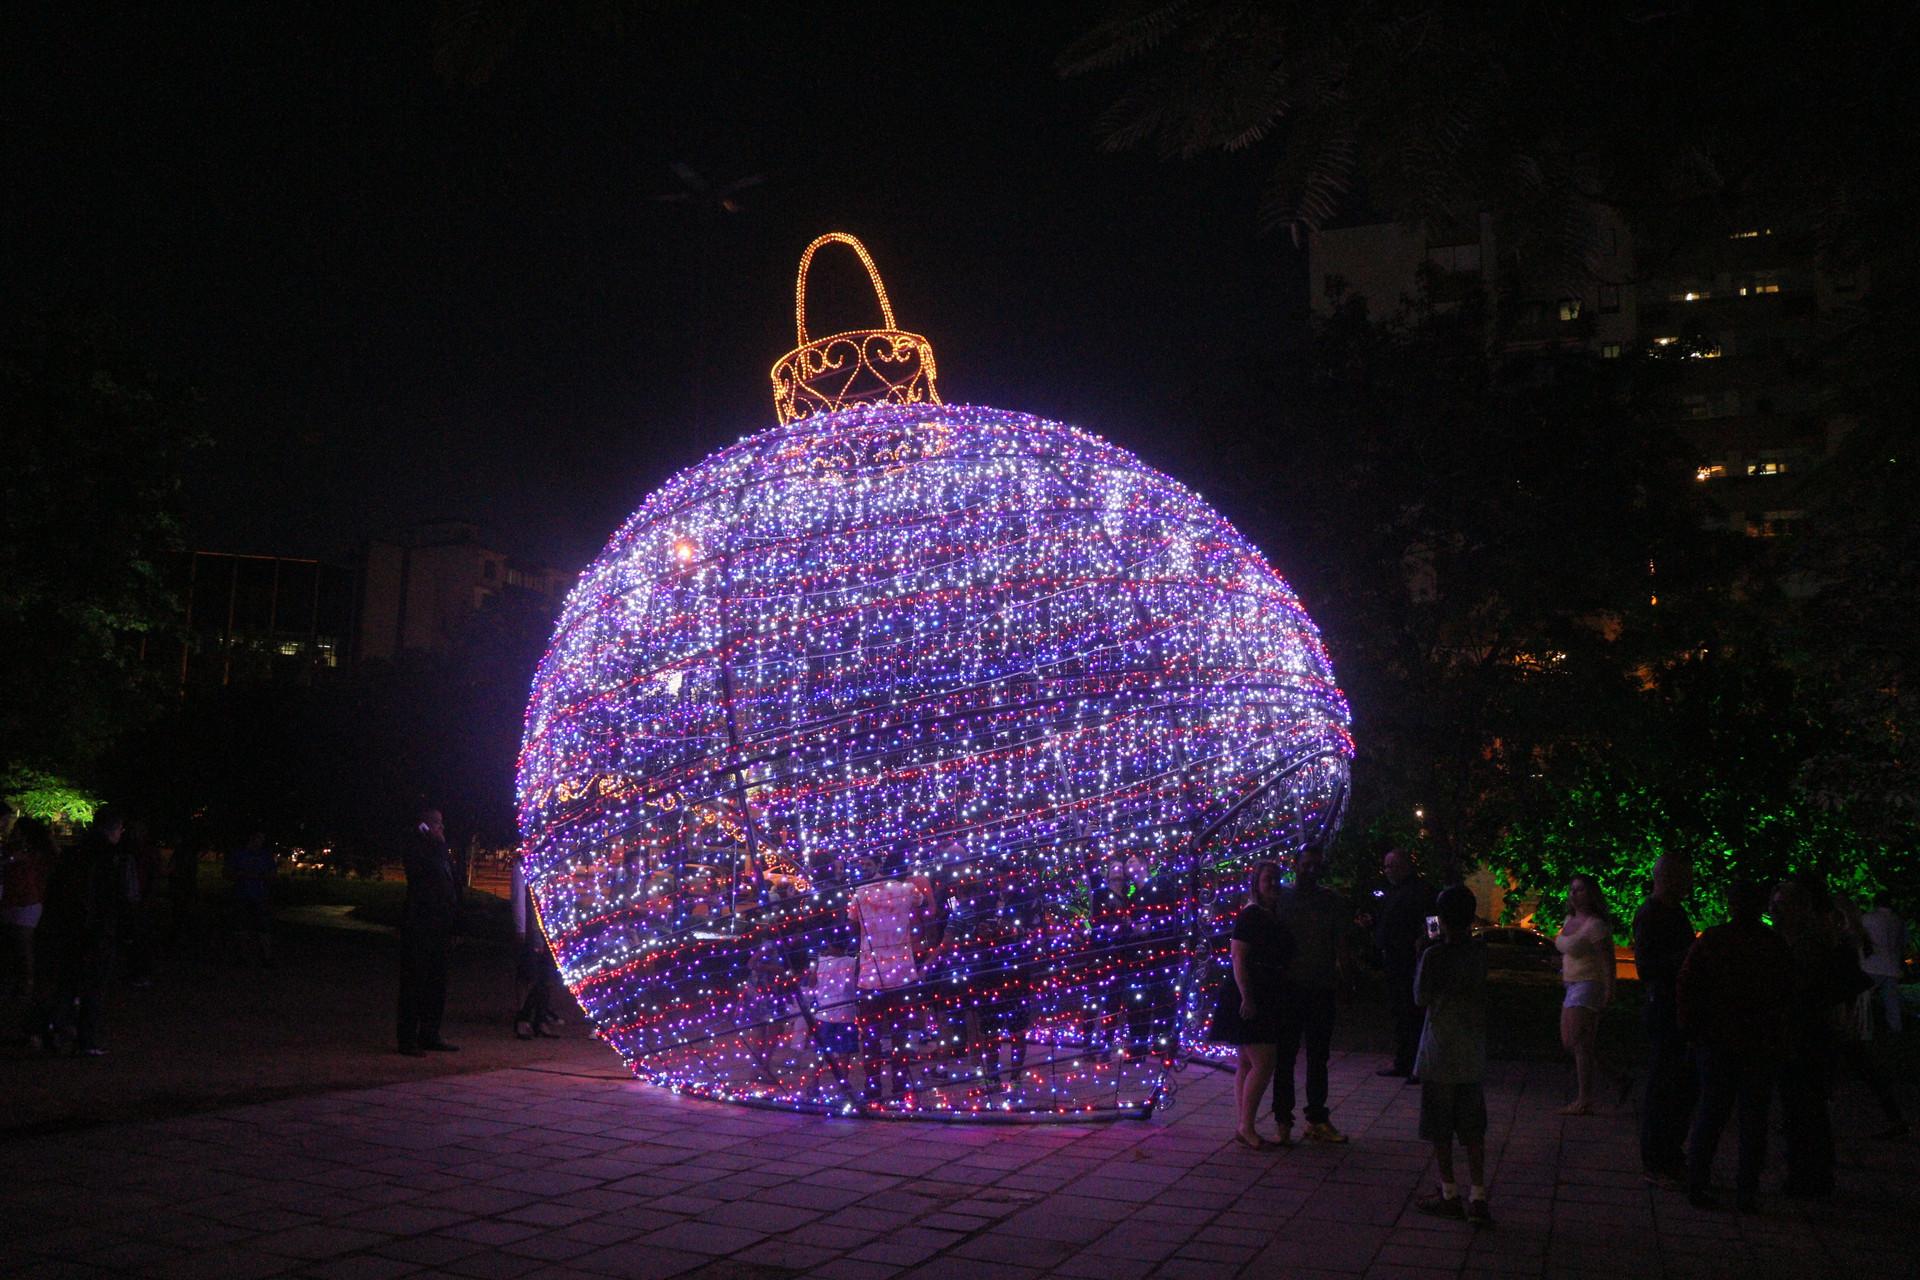 Bola de natal (2016)